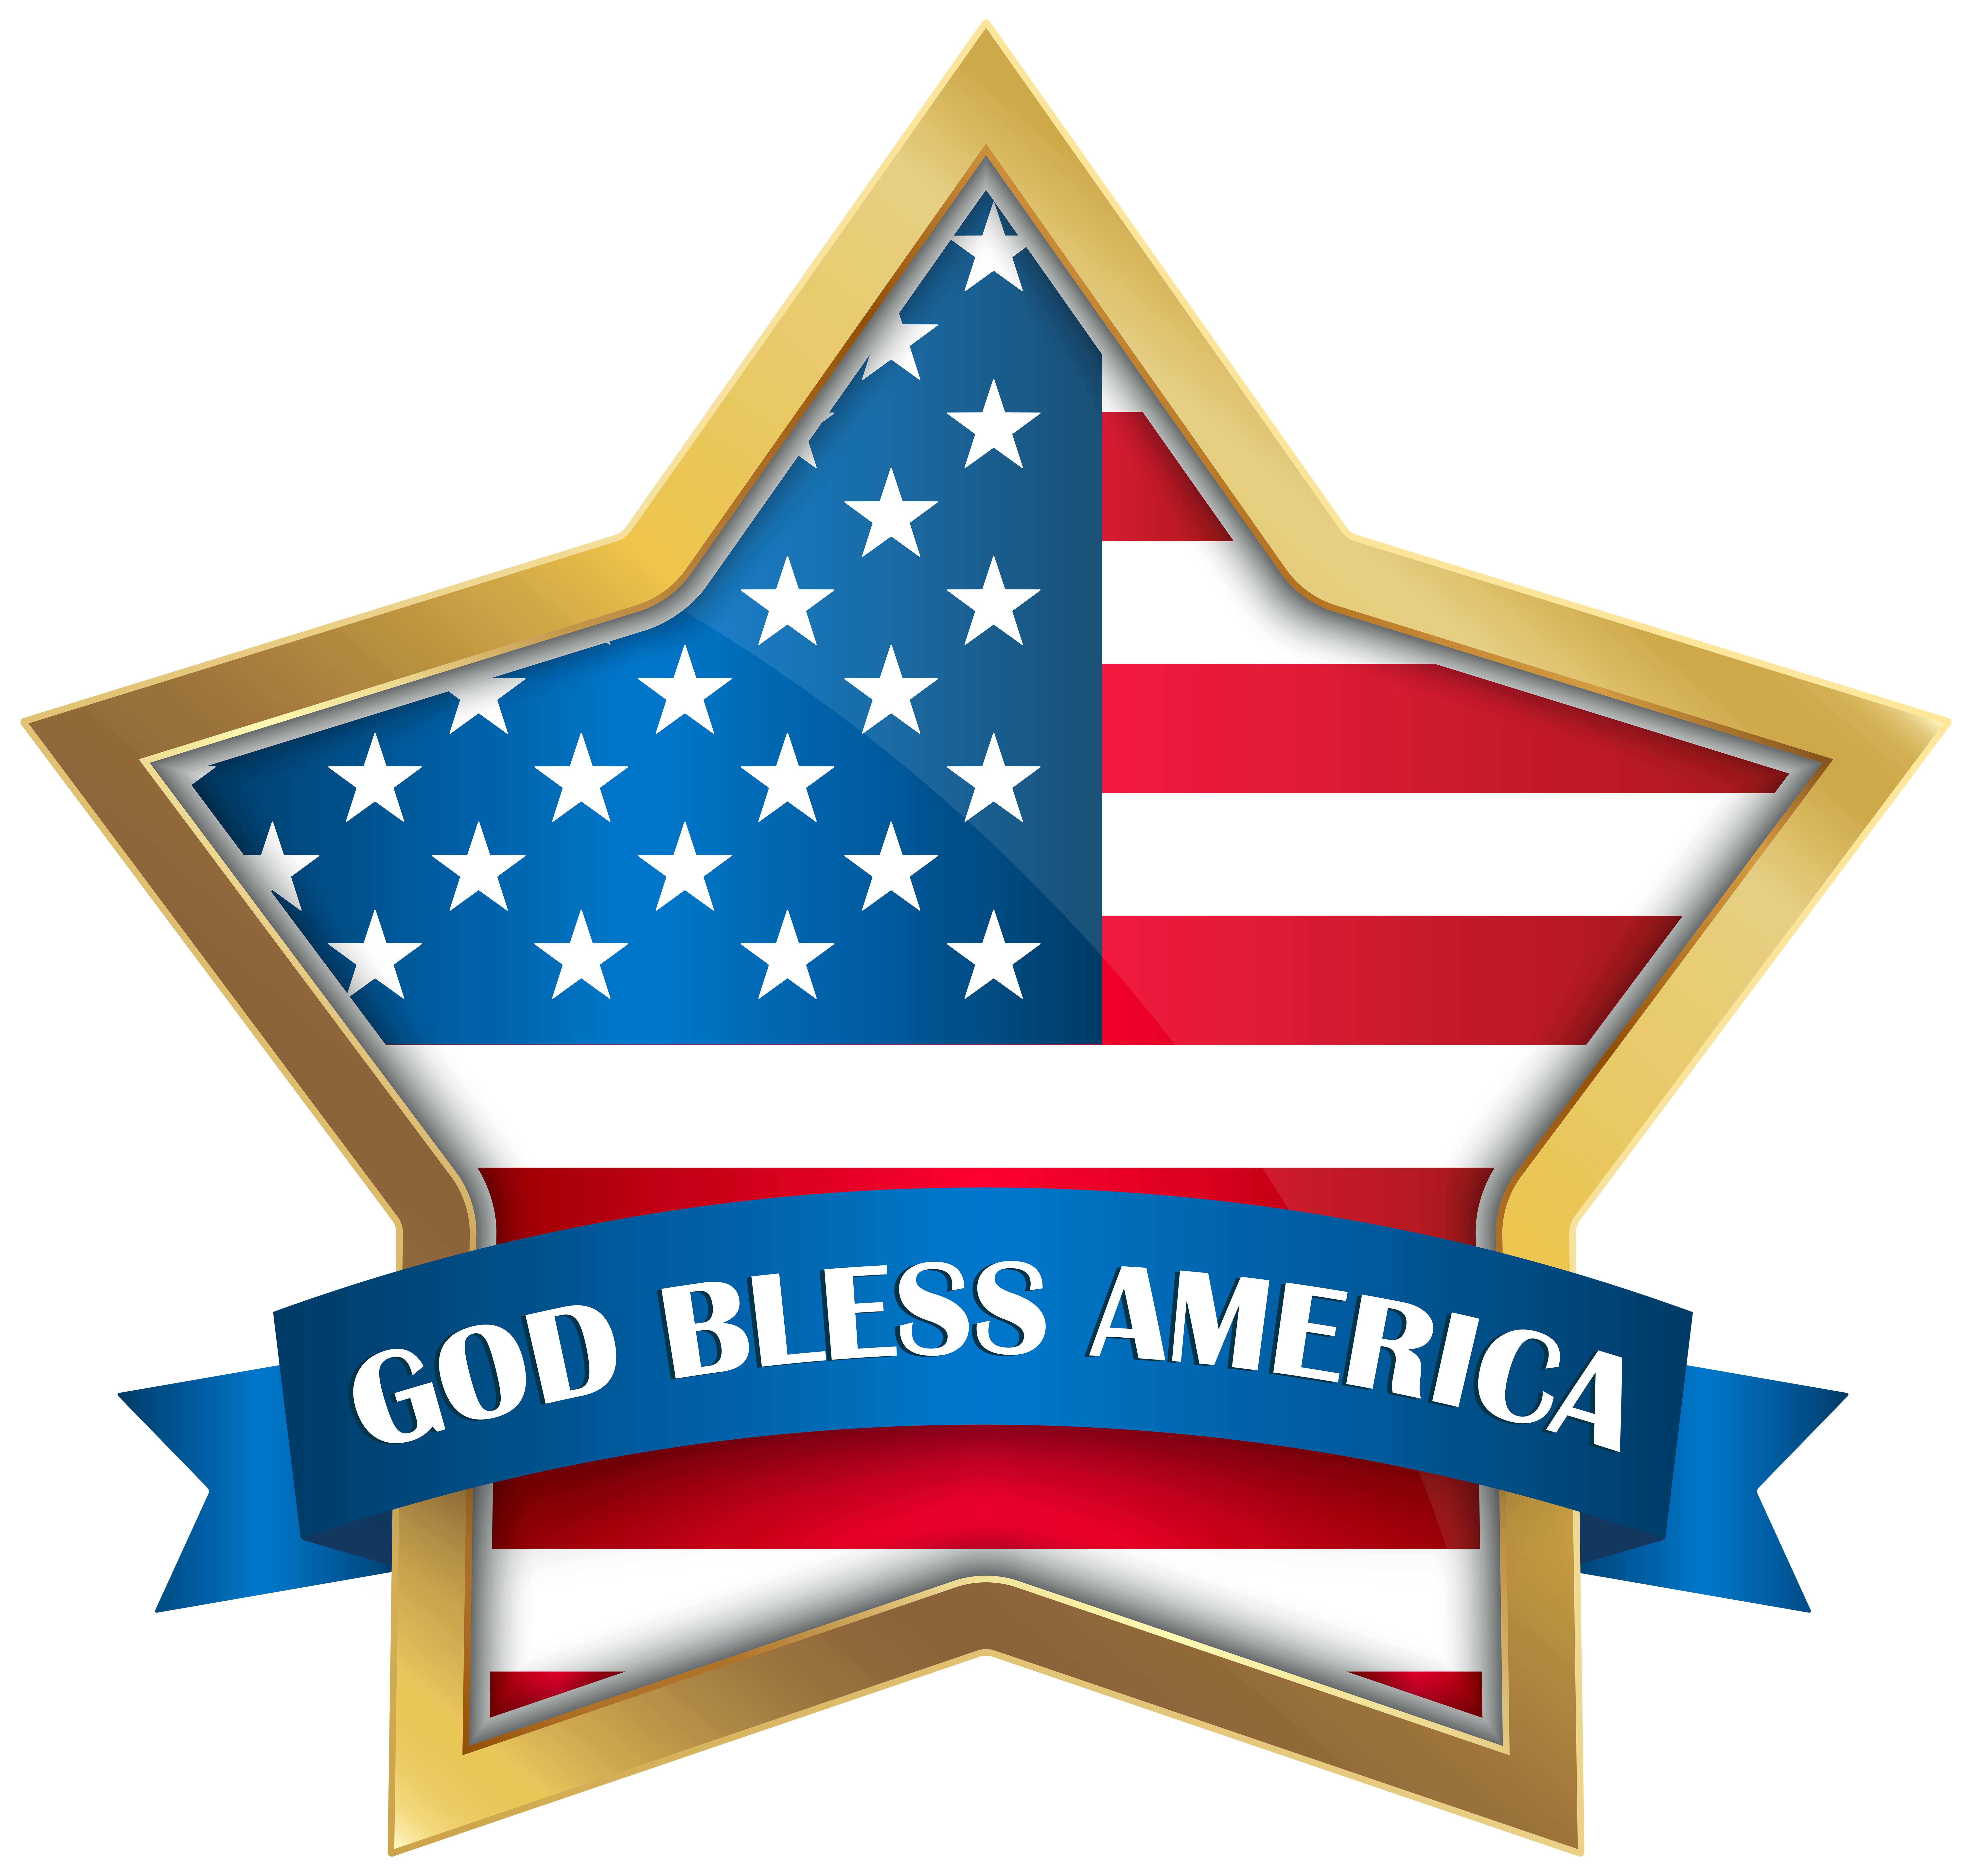 Bless america star png. God clipart god provides